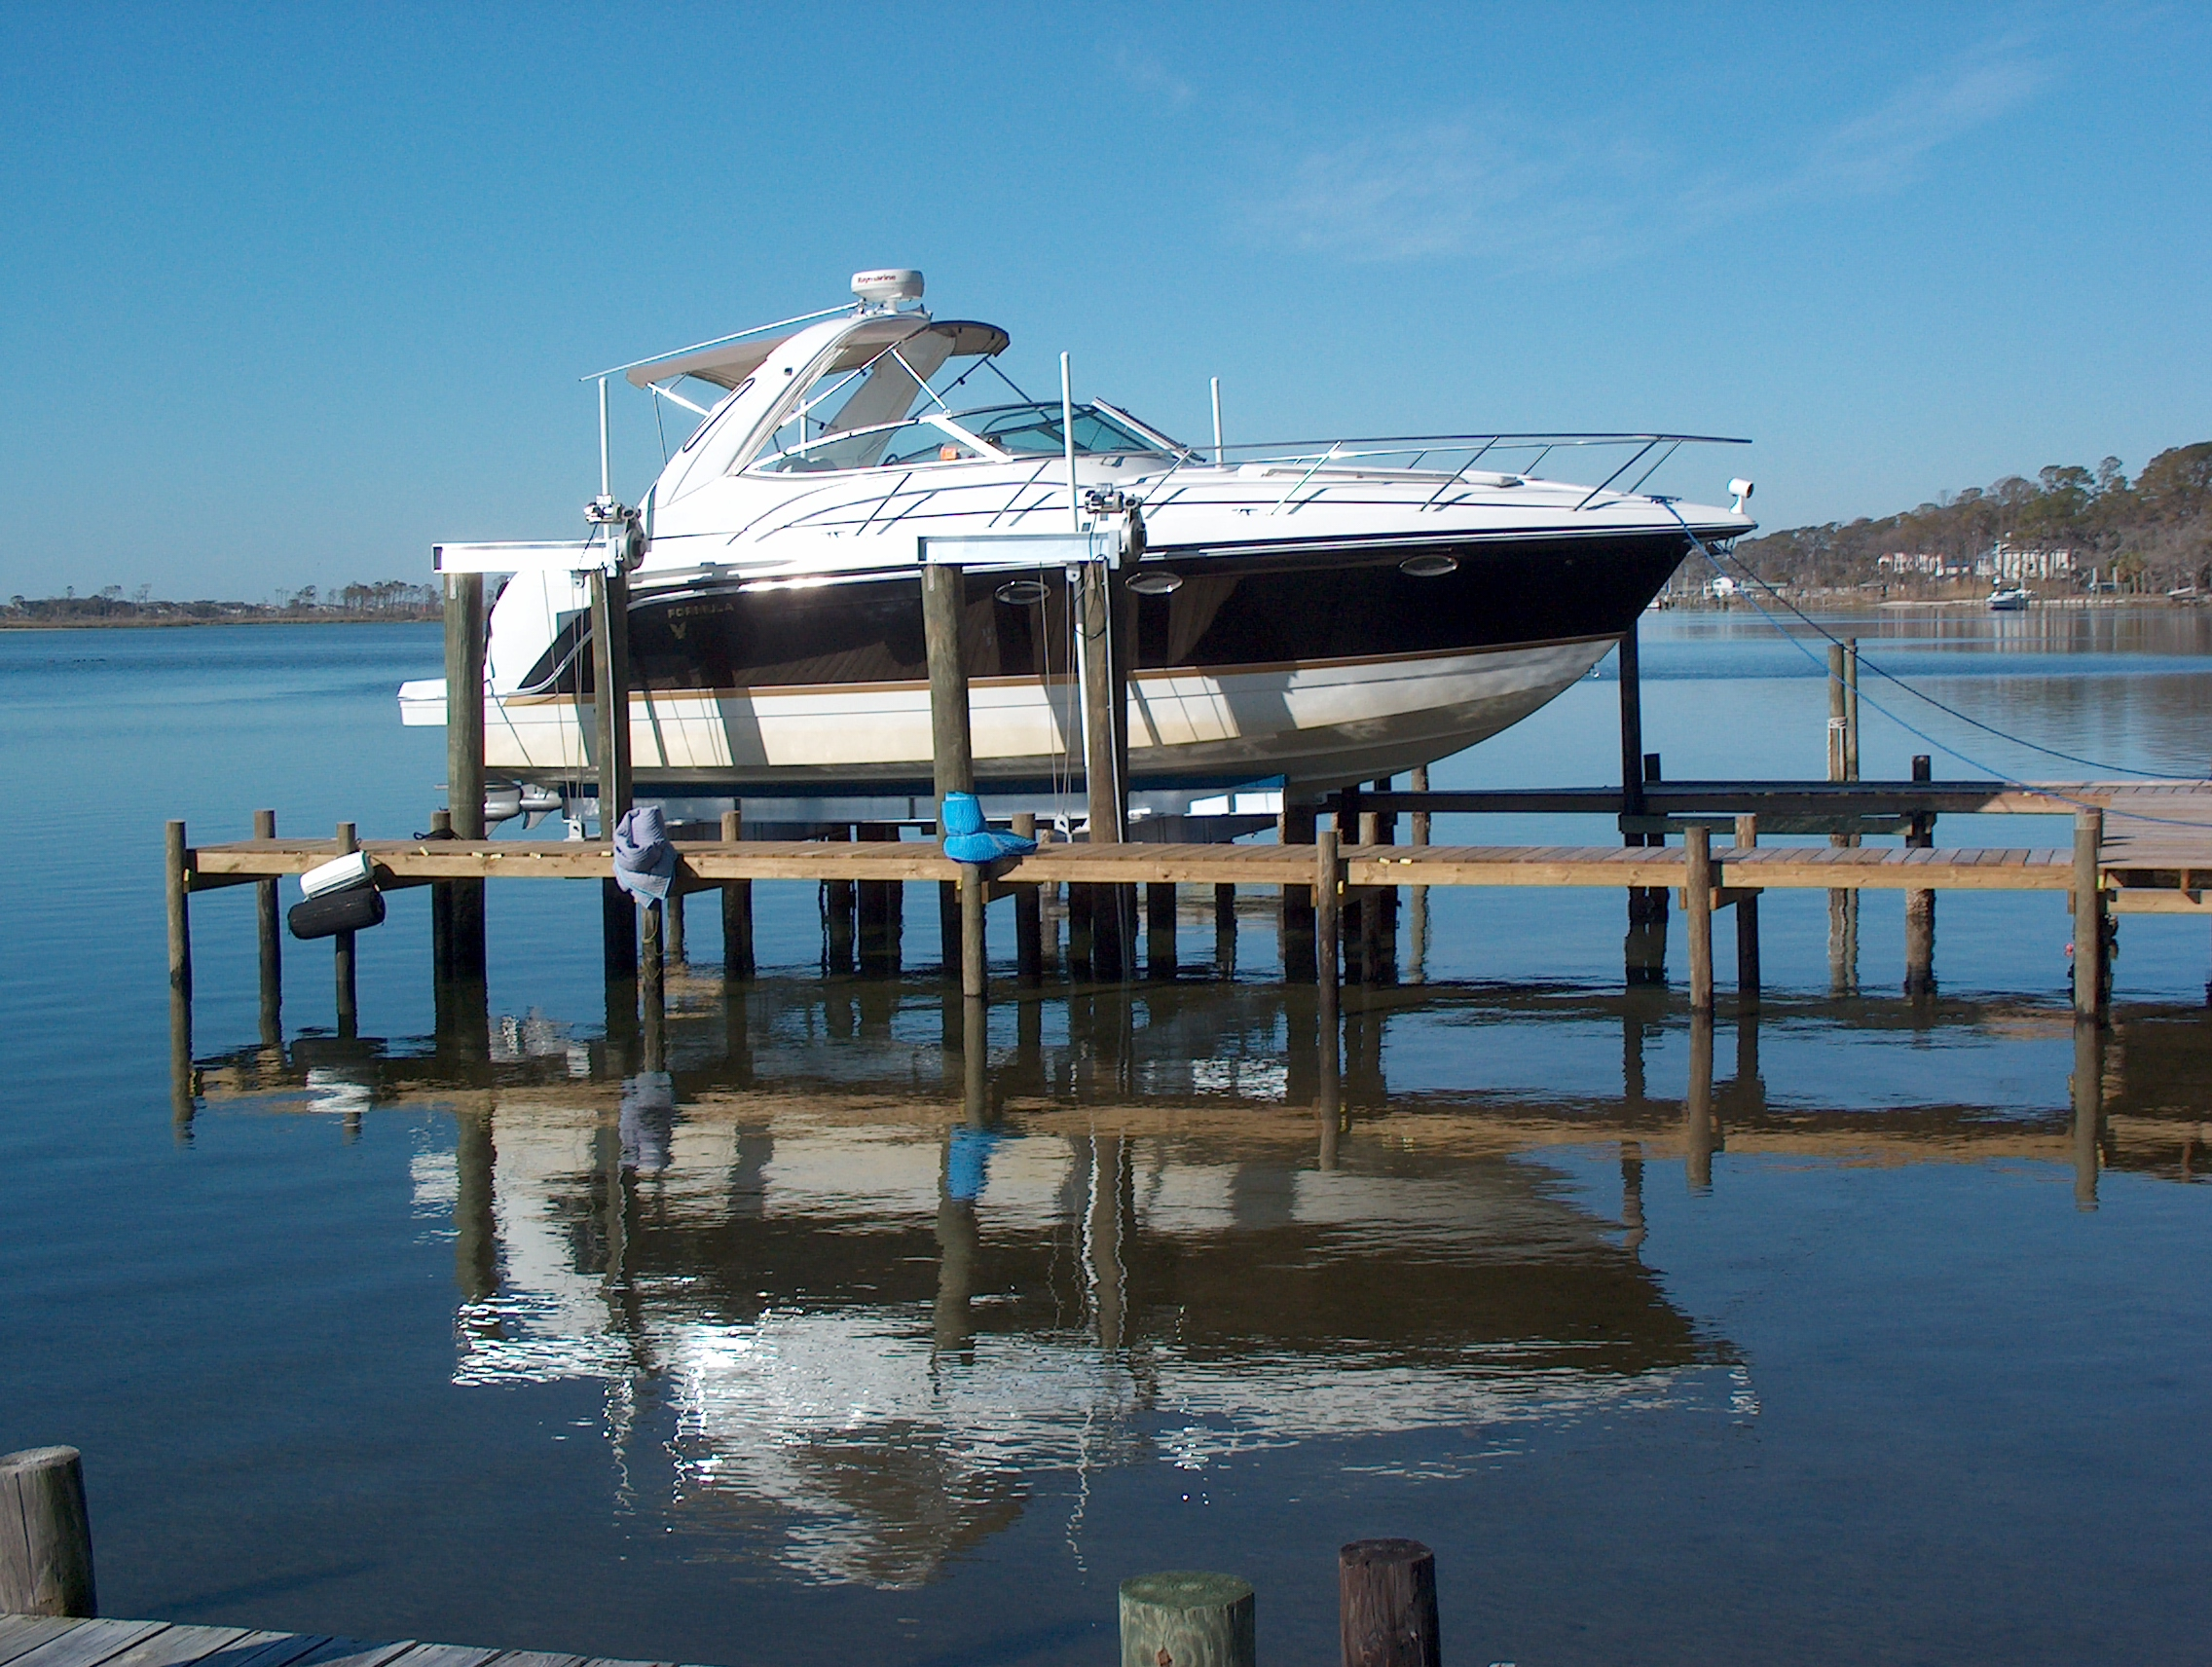 4-Motor 8-Piling Lift for Big Boats